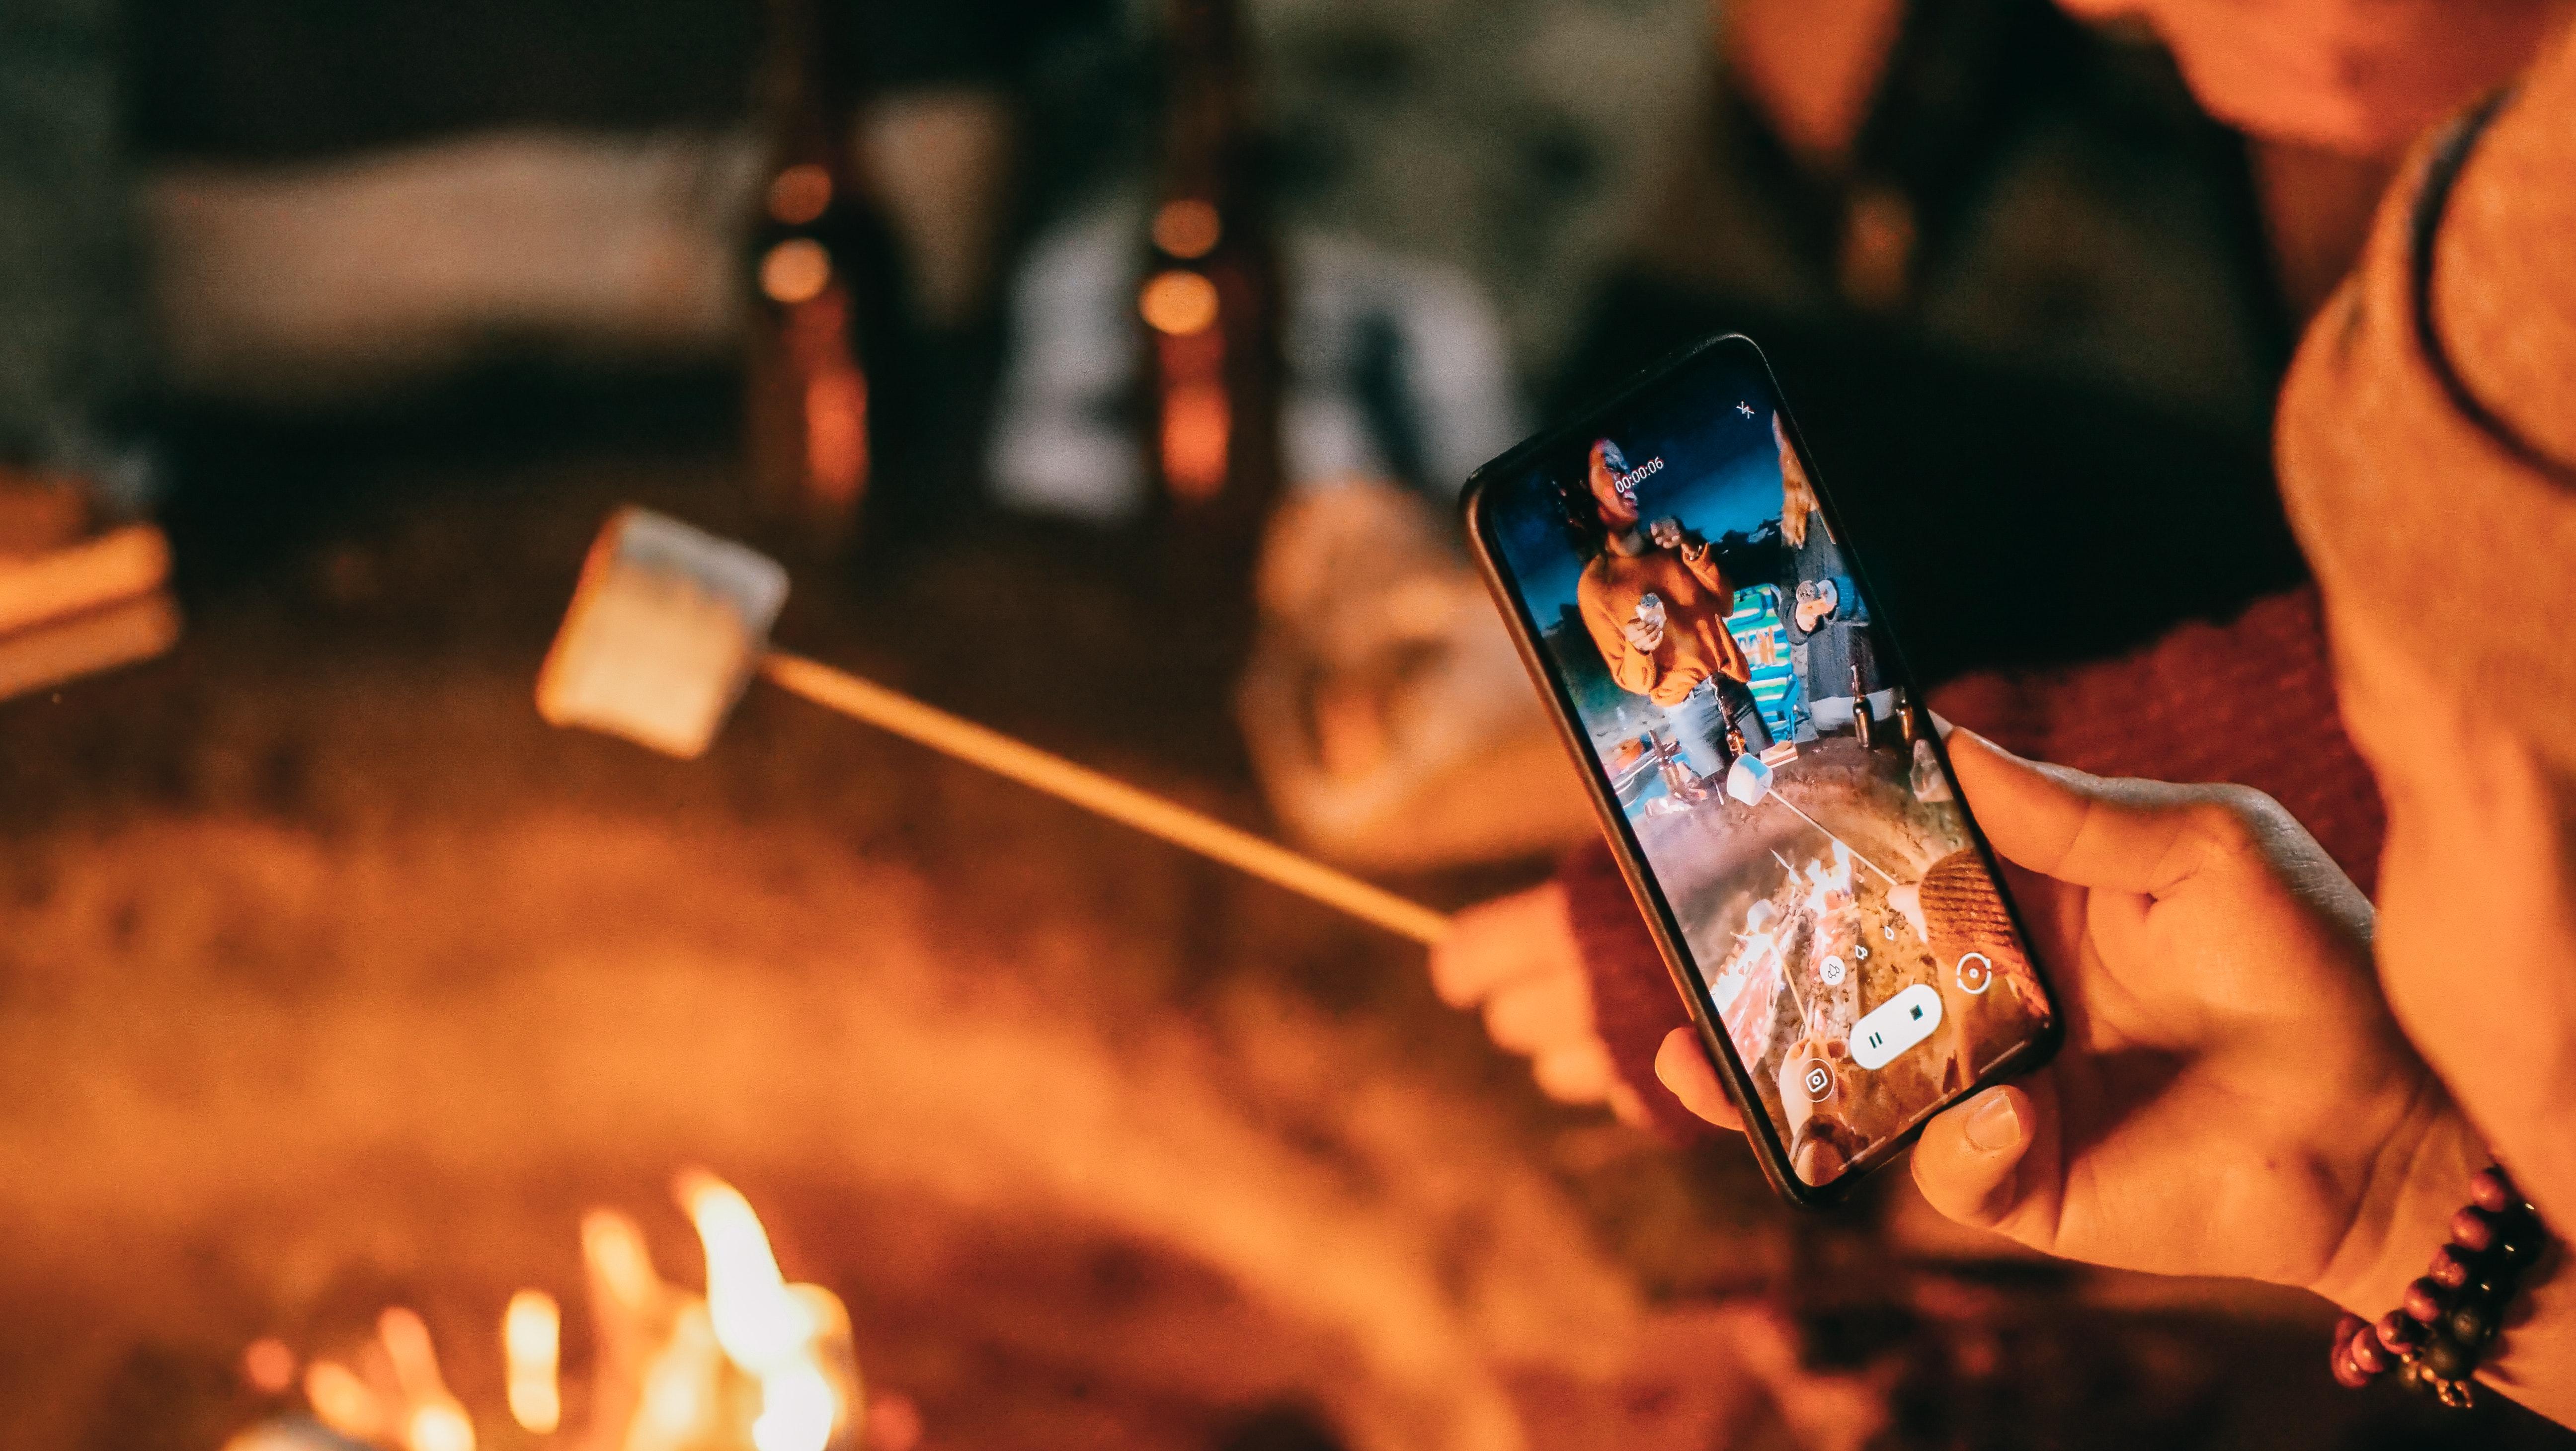 enjoying-the-campfire-while-camping-at-a-beach